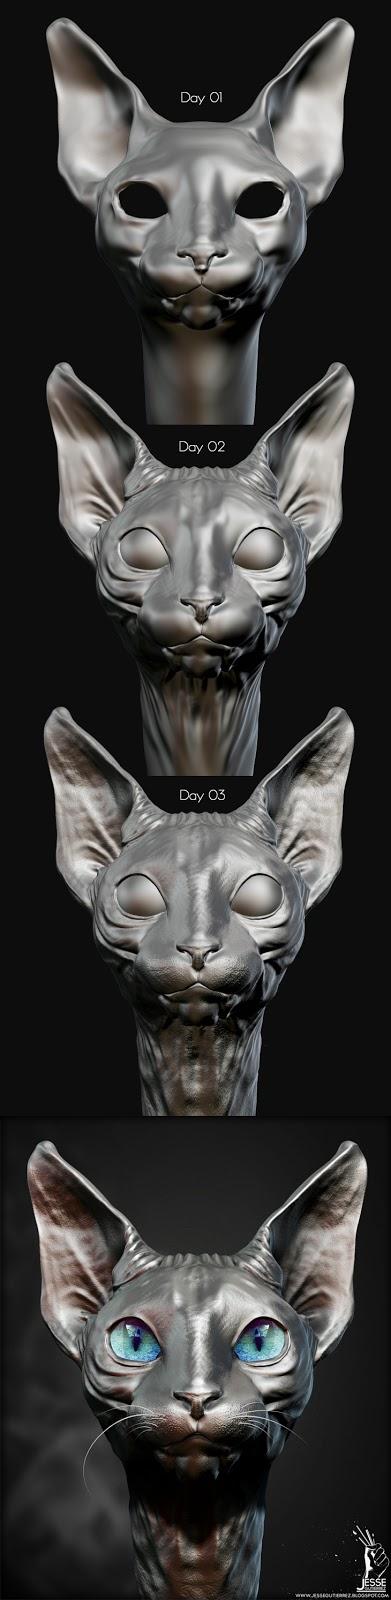 Jesse Gutierrez Art - Sphynx Cat, Zbrush, 3d, Peru,artista peruano 3d diseño 3d